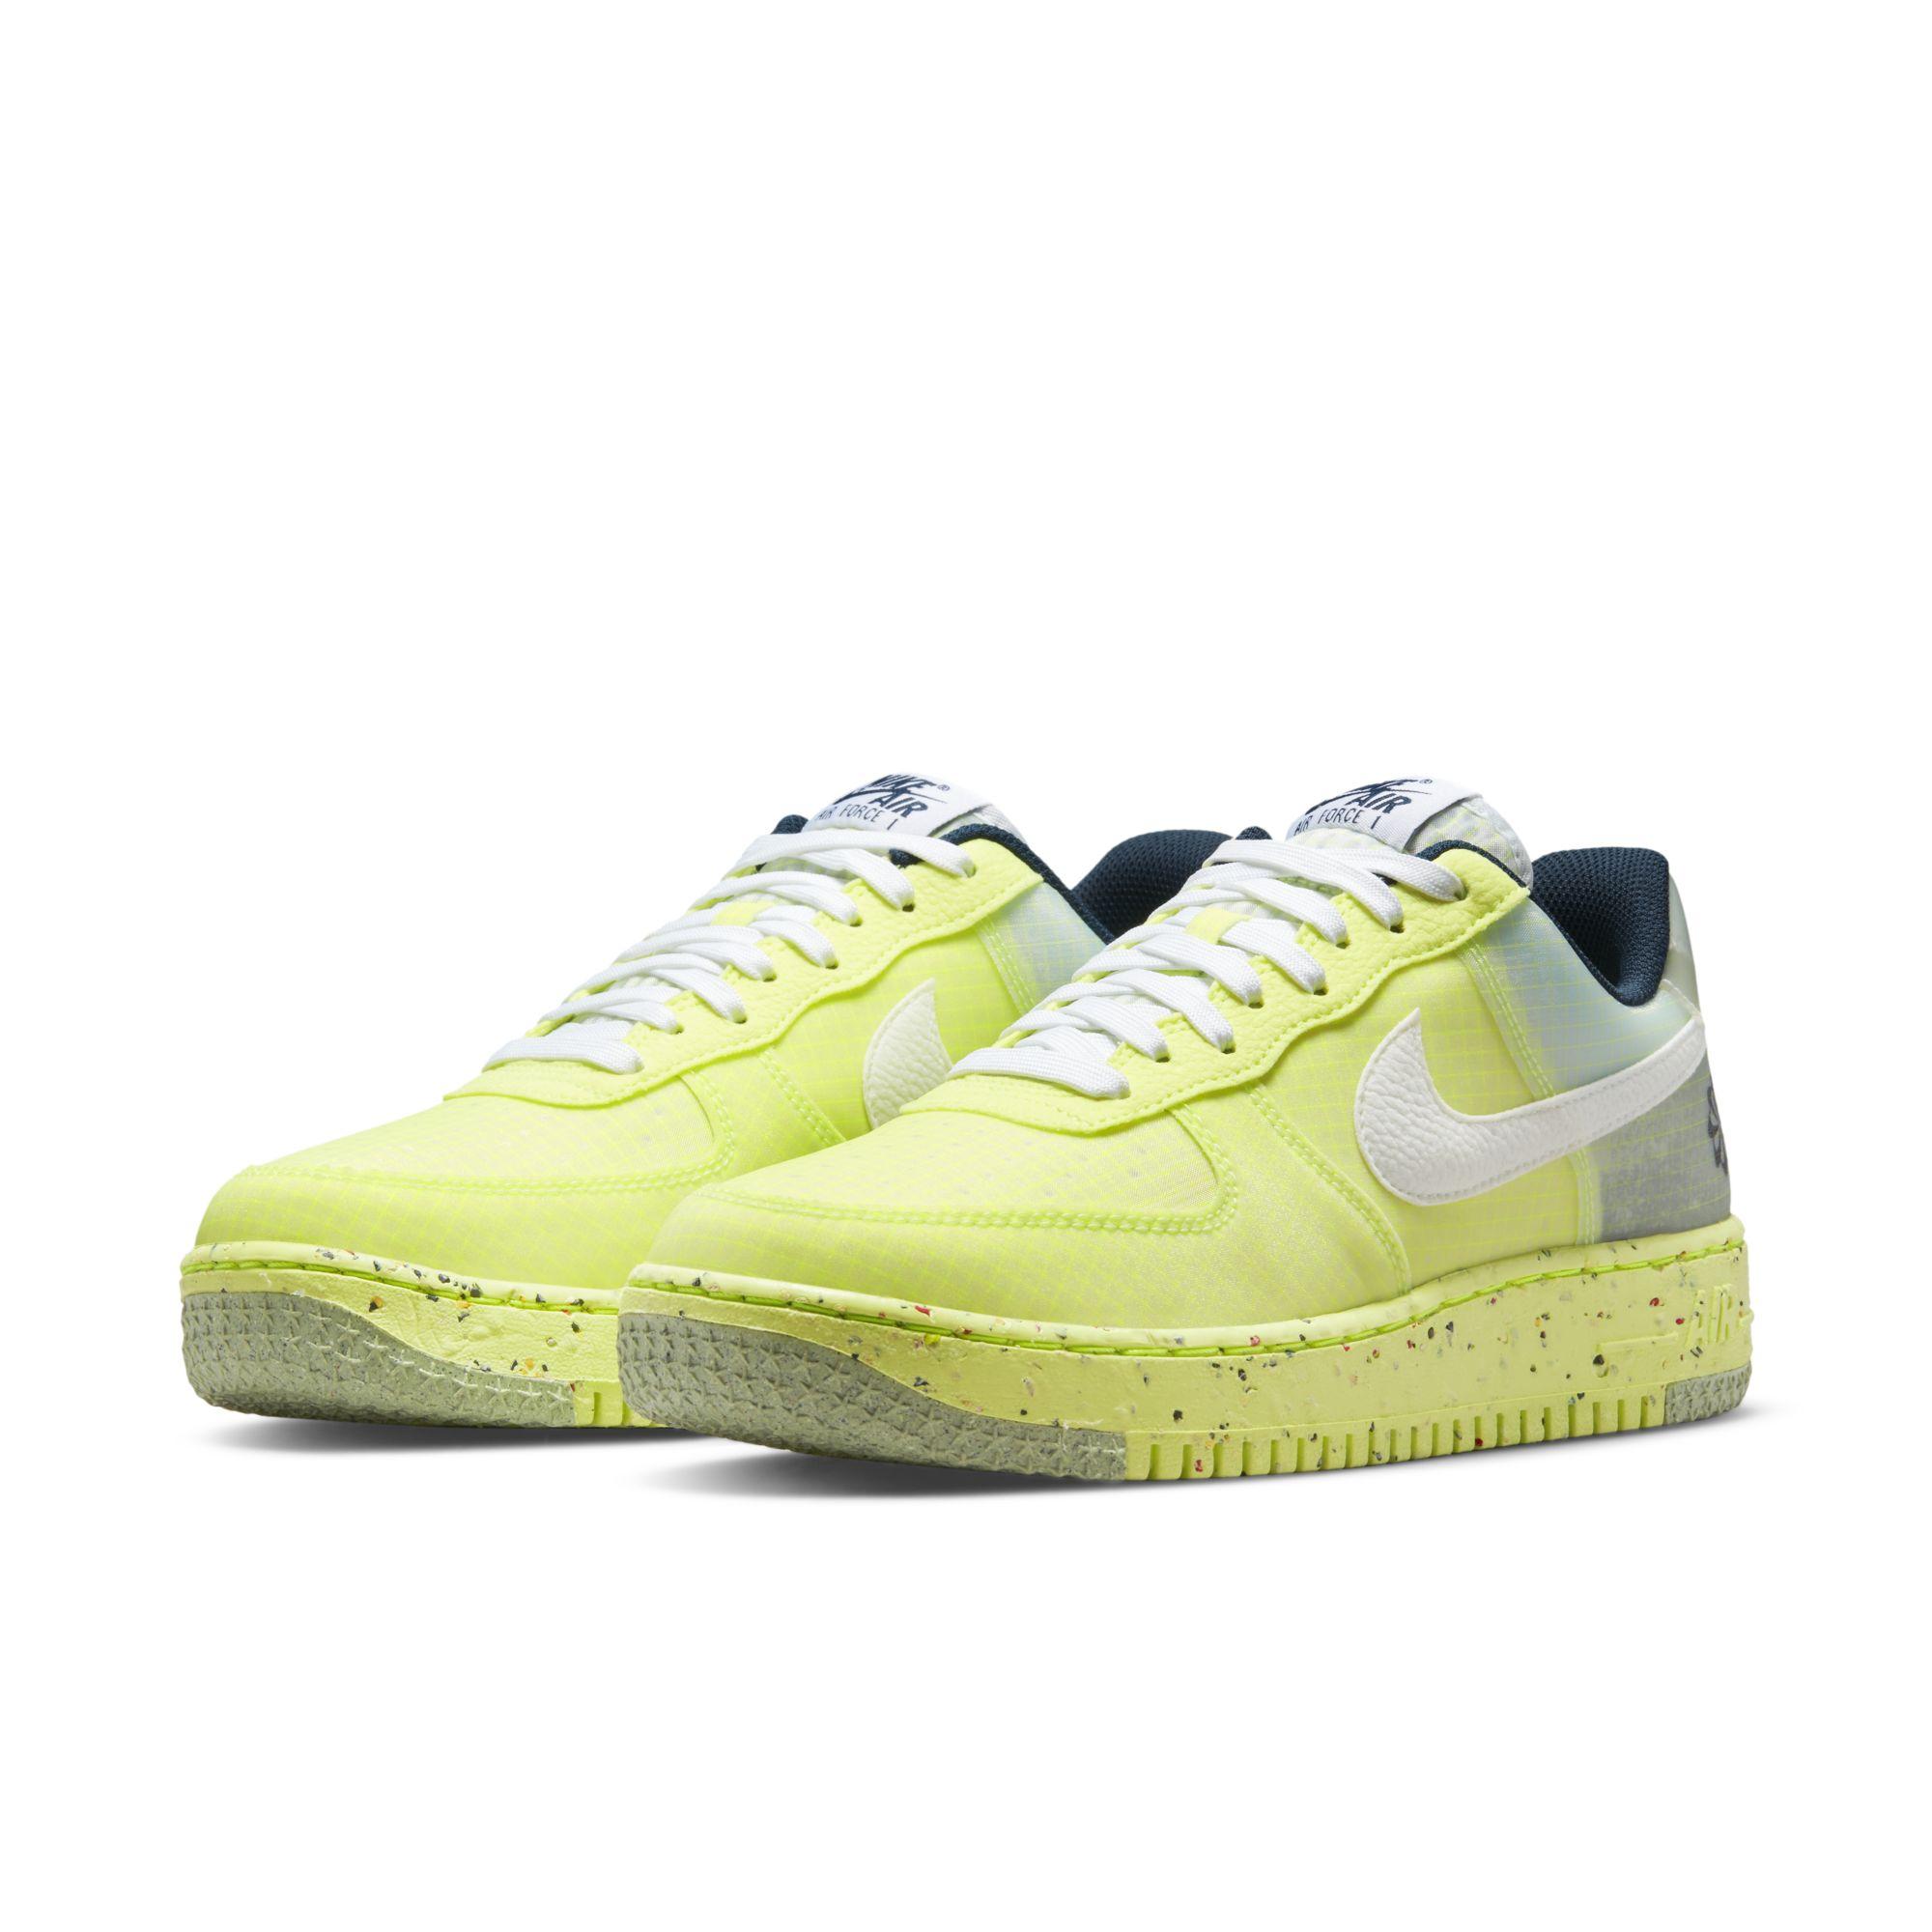 Nike,Air Force 1  「柠檬」配色!全新 Air Force 1 官图曝光!